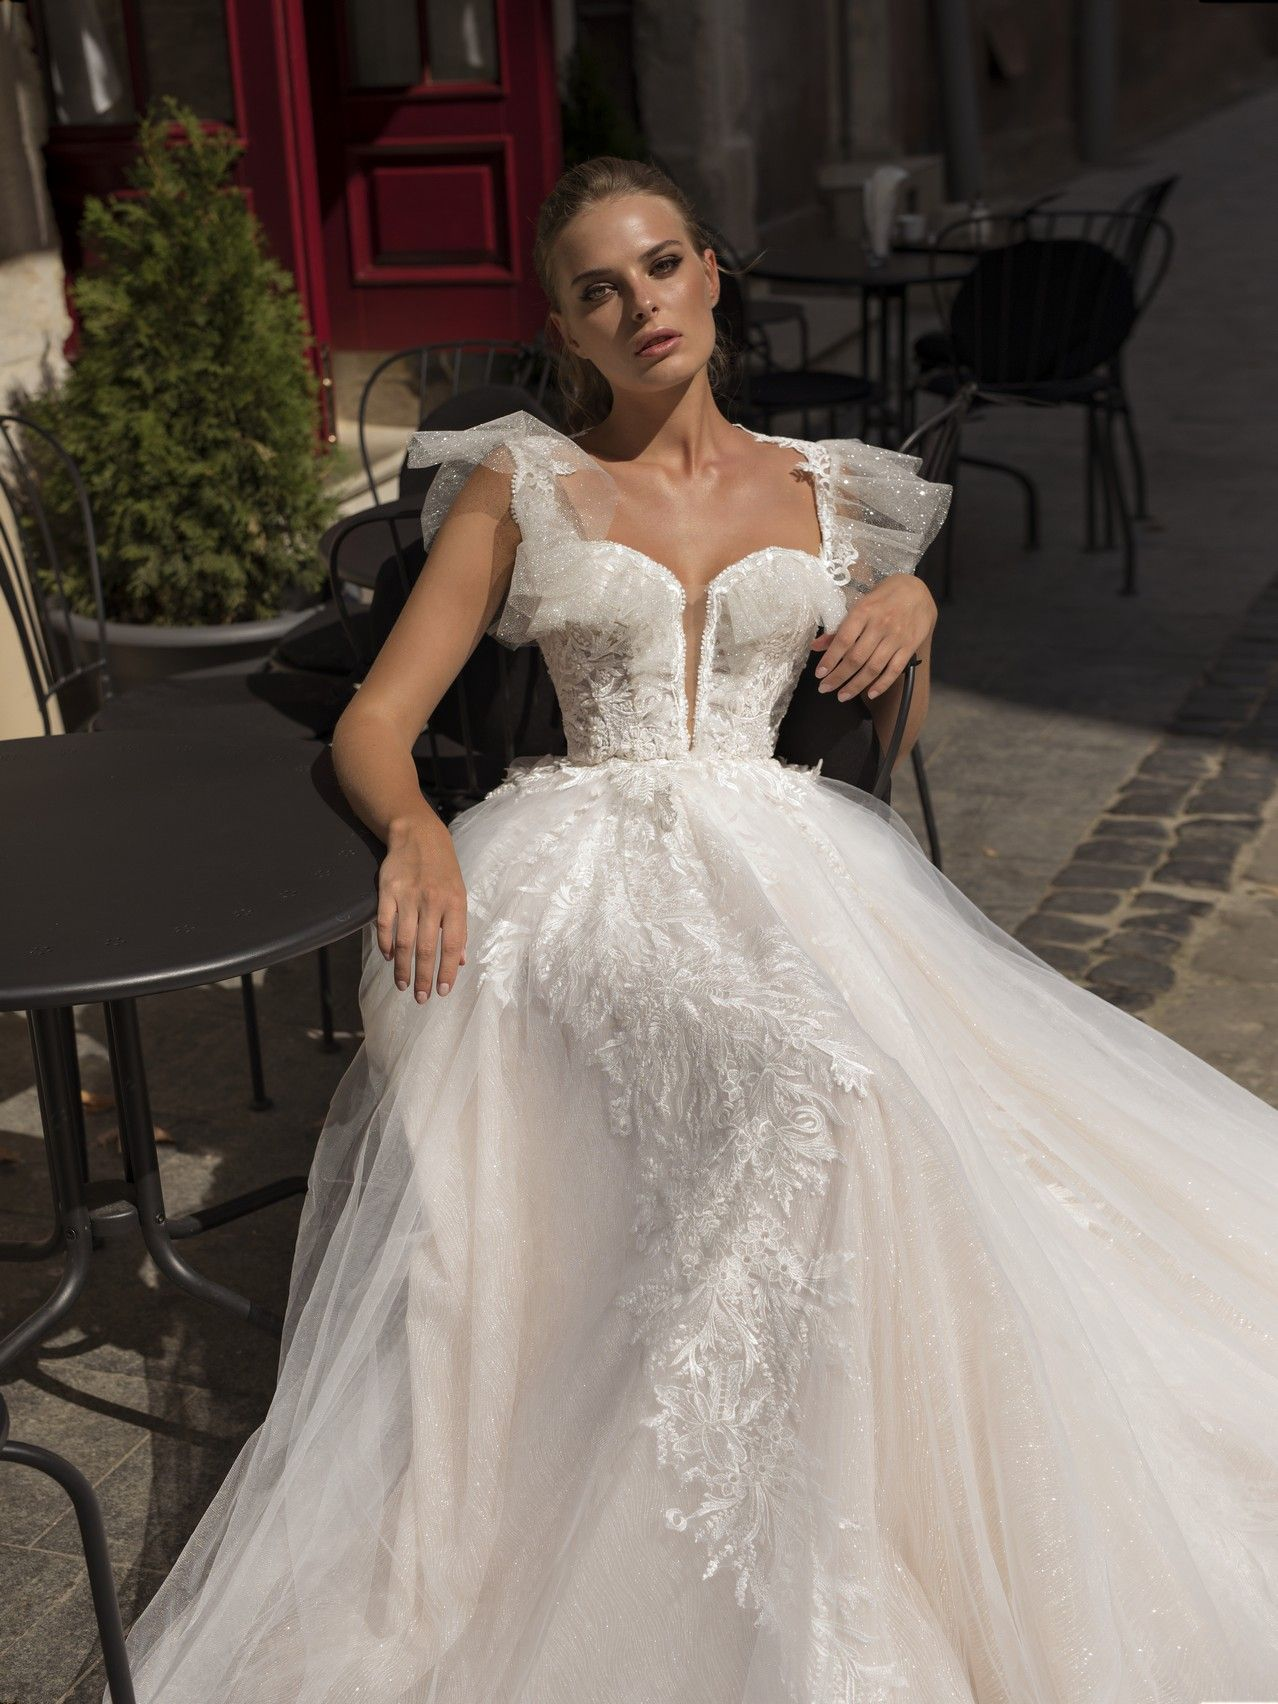 Liv Amor Collection Noya By Riki Dalal Wedding Dresses Glasgow Vintage Style Wedding Dresses Ball Gowns Wedding